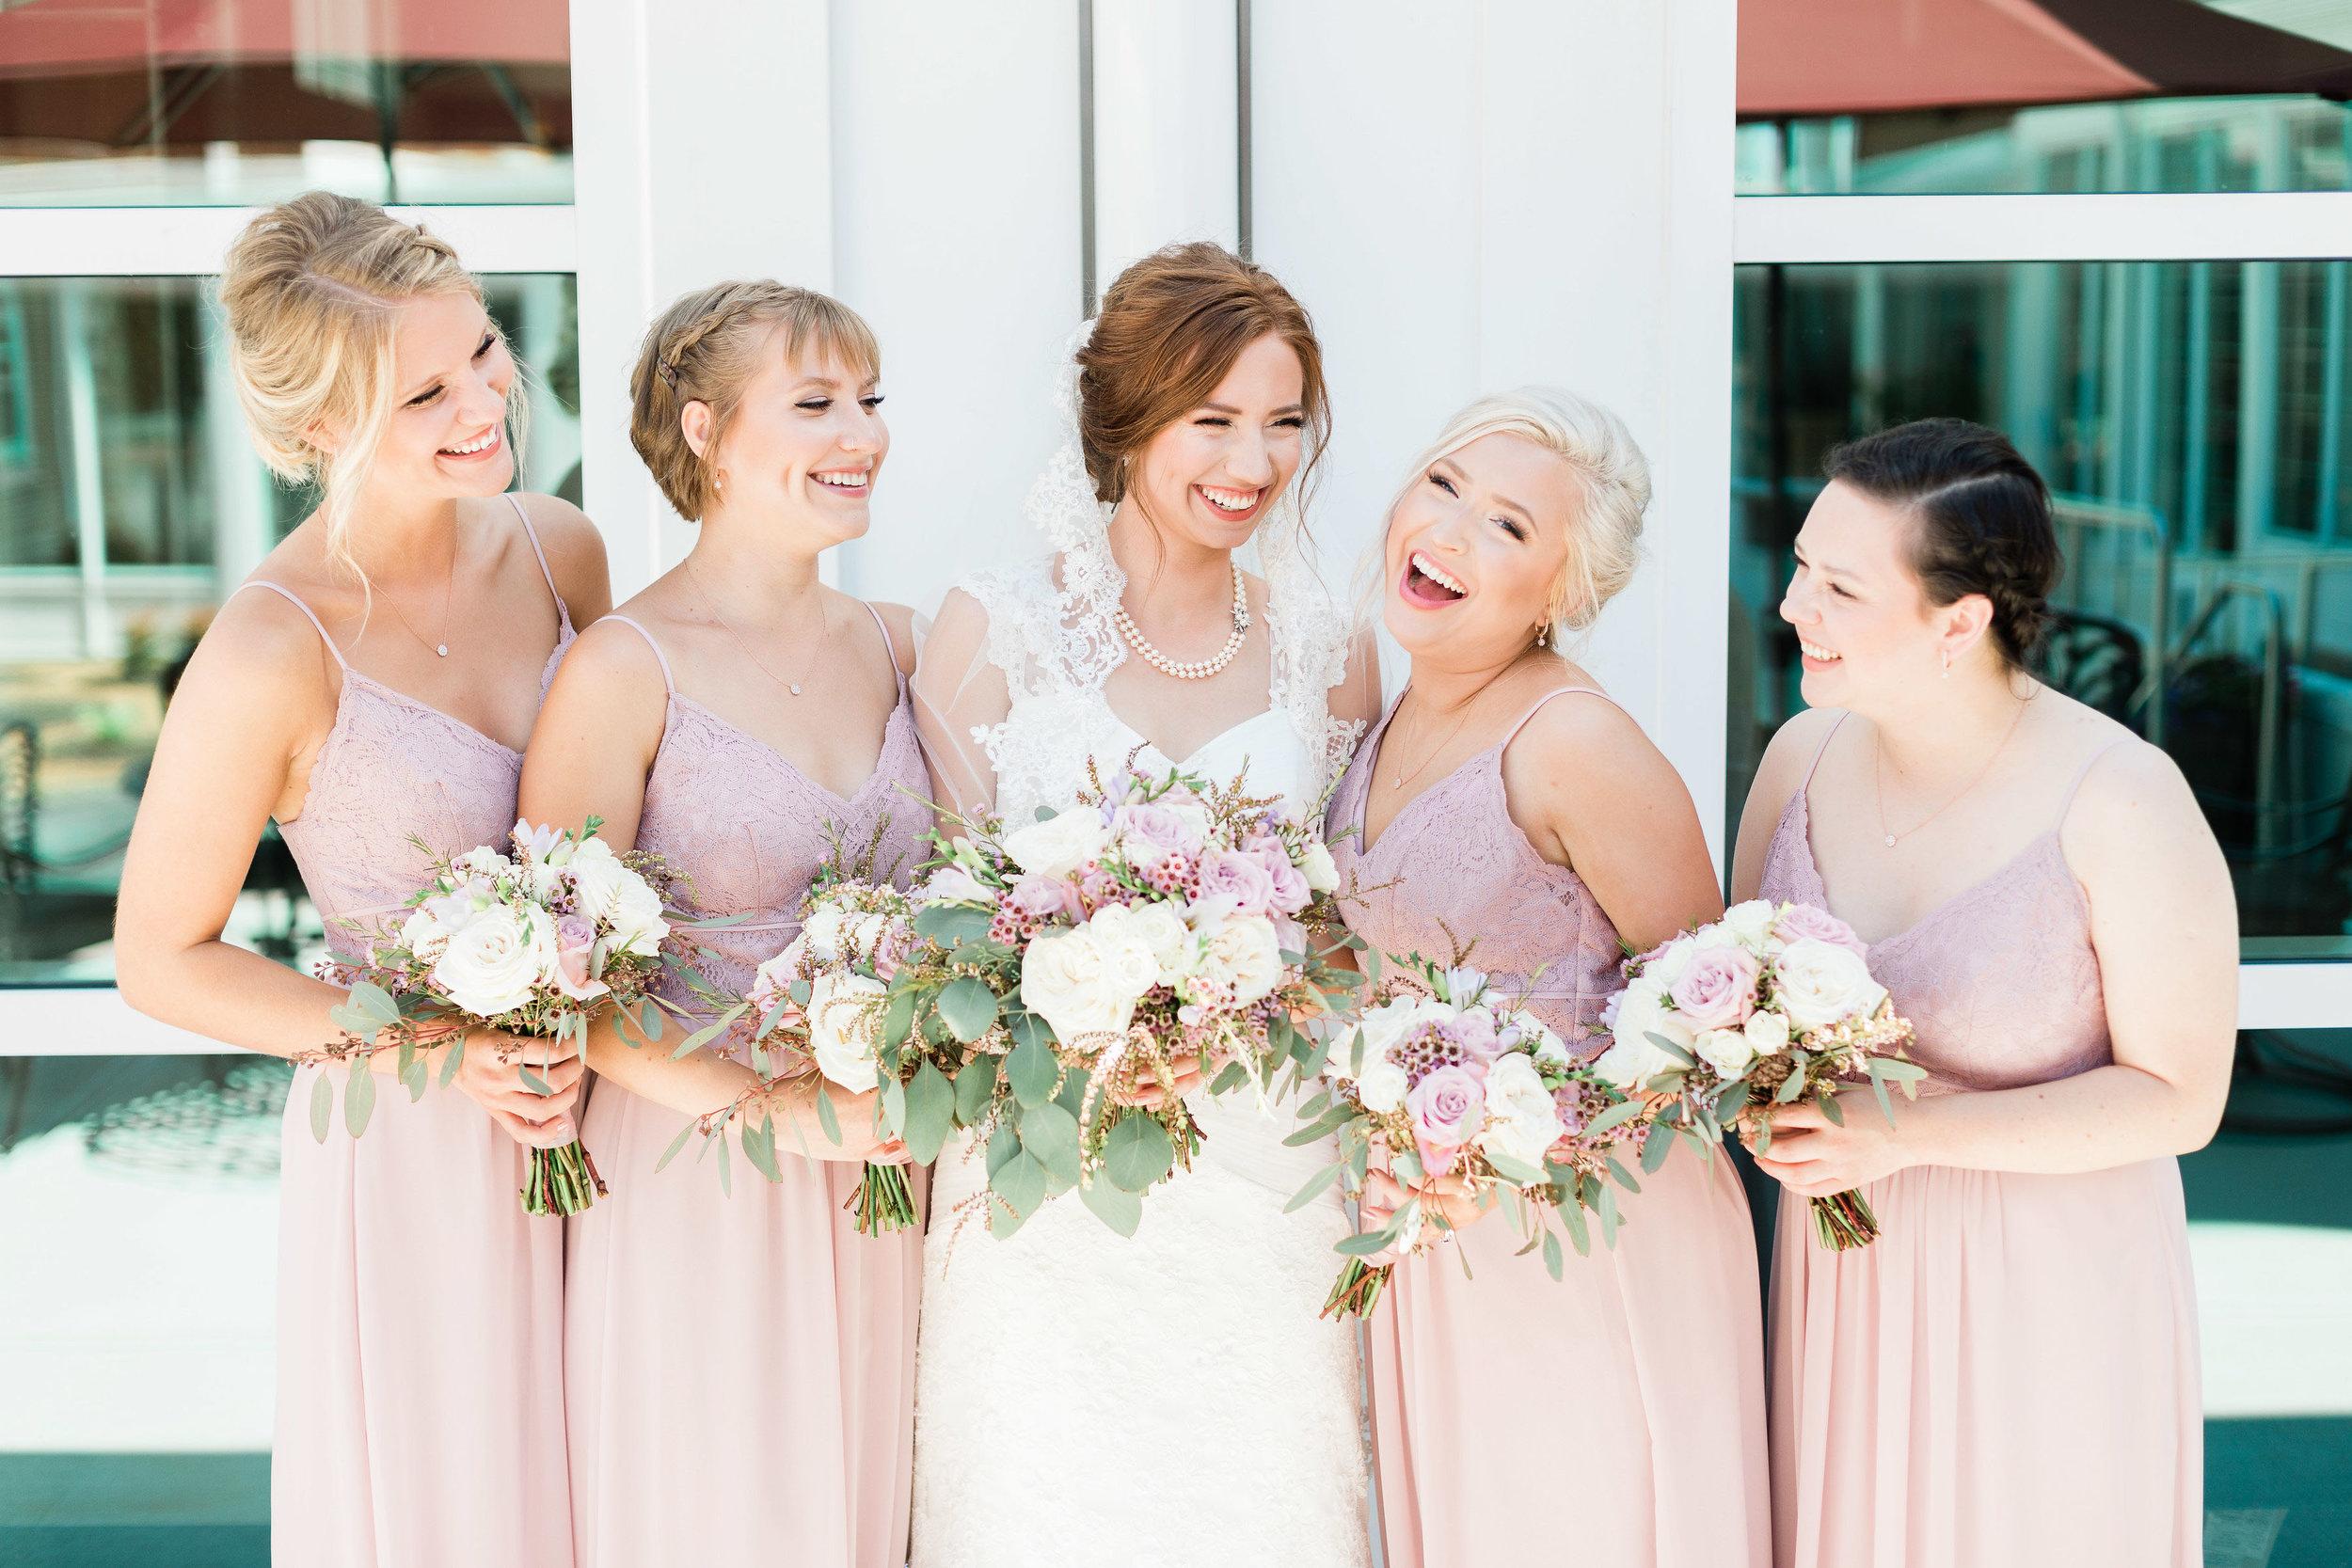 lauren day photography cincinnati wedding photographer bridal party pictures-2.jpg